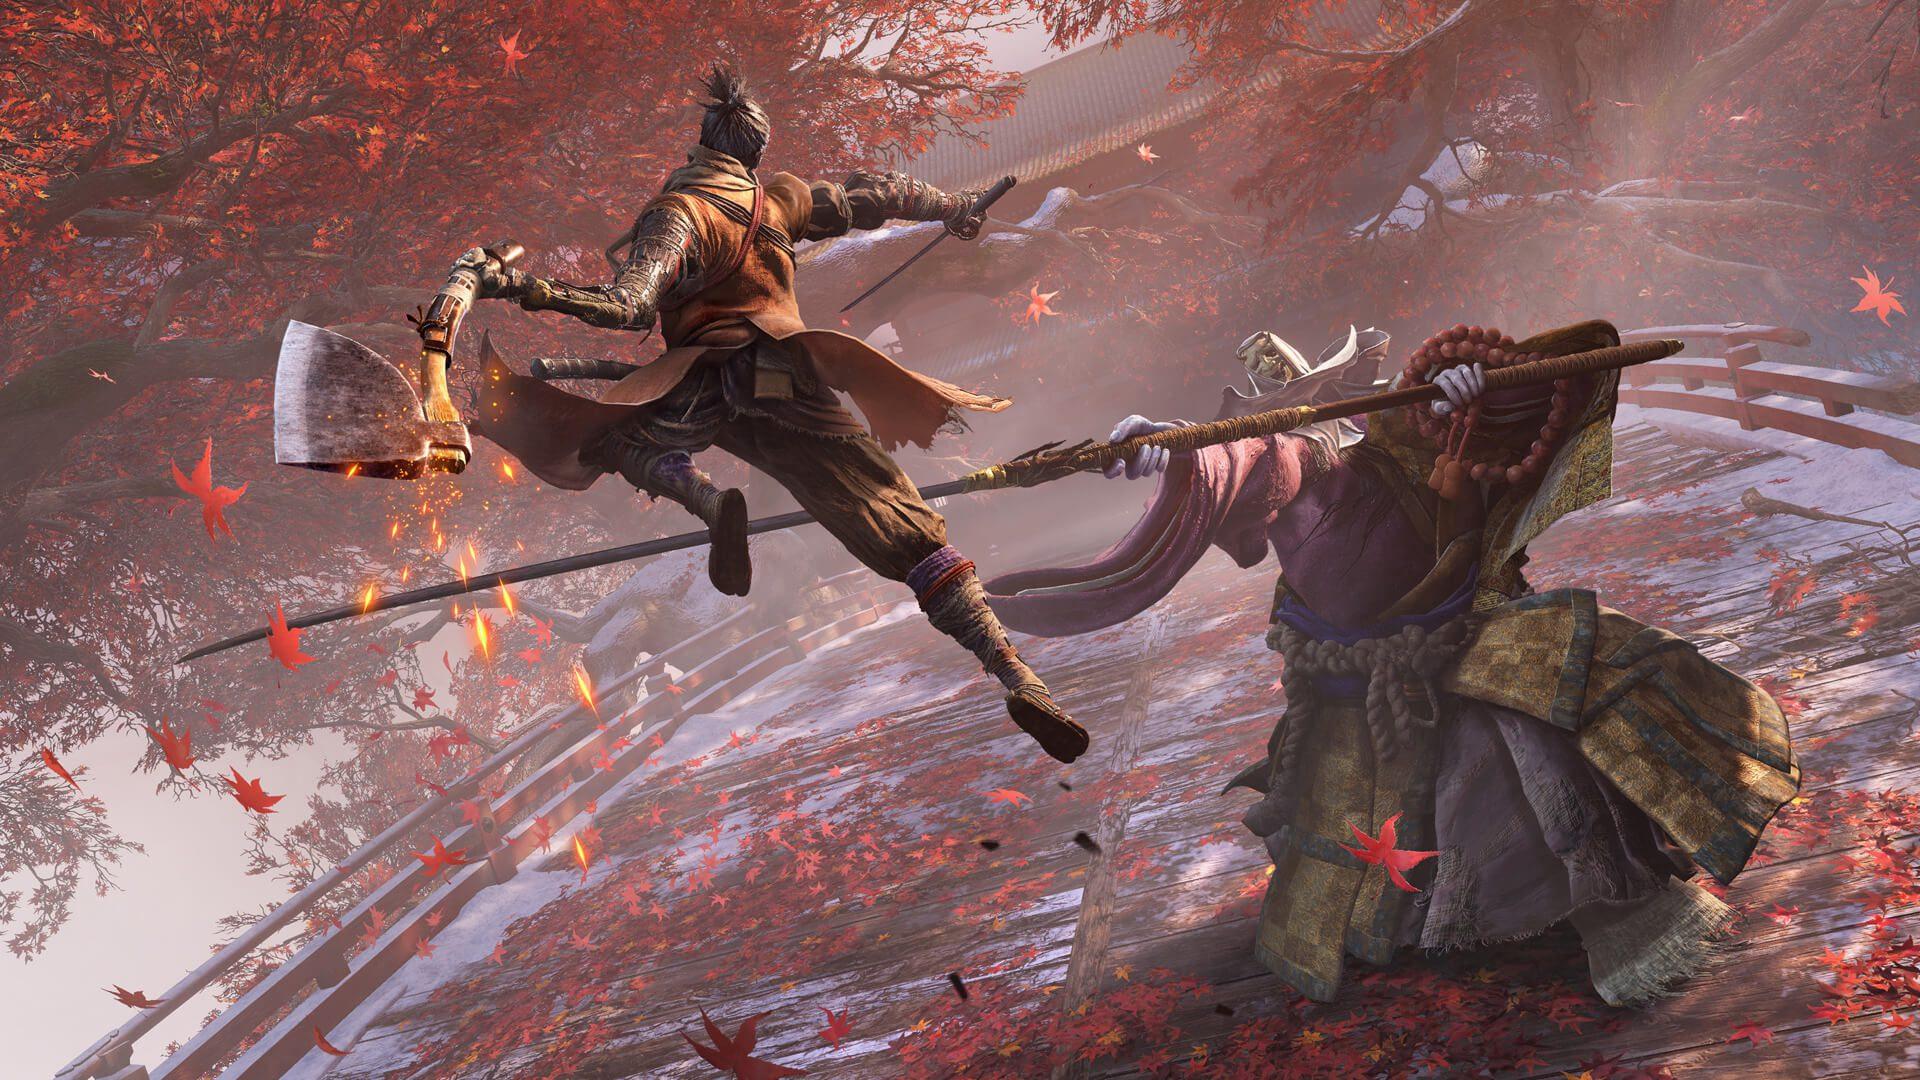 Sekiro: Shadows Die Twice gets an Enemy and Item Randomizer Mod